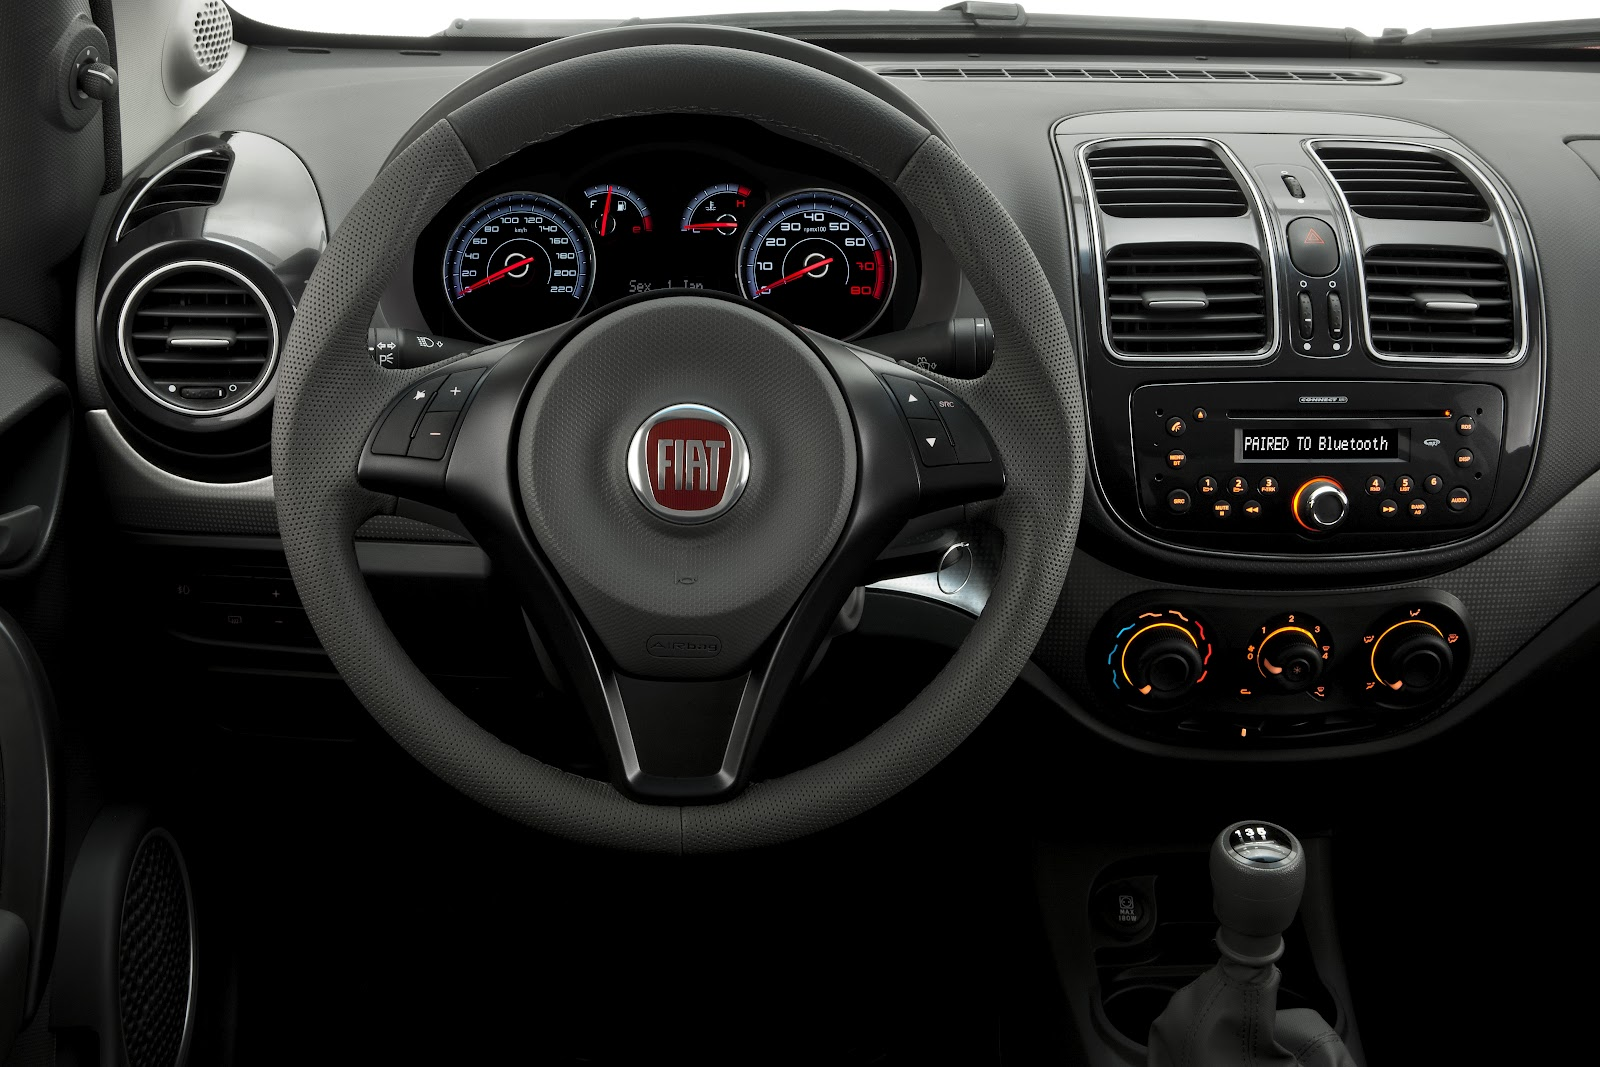 Fiat Grand Siena já está disponível para demonstração e teste na Carboni Fiat attractive 025